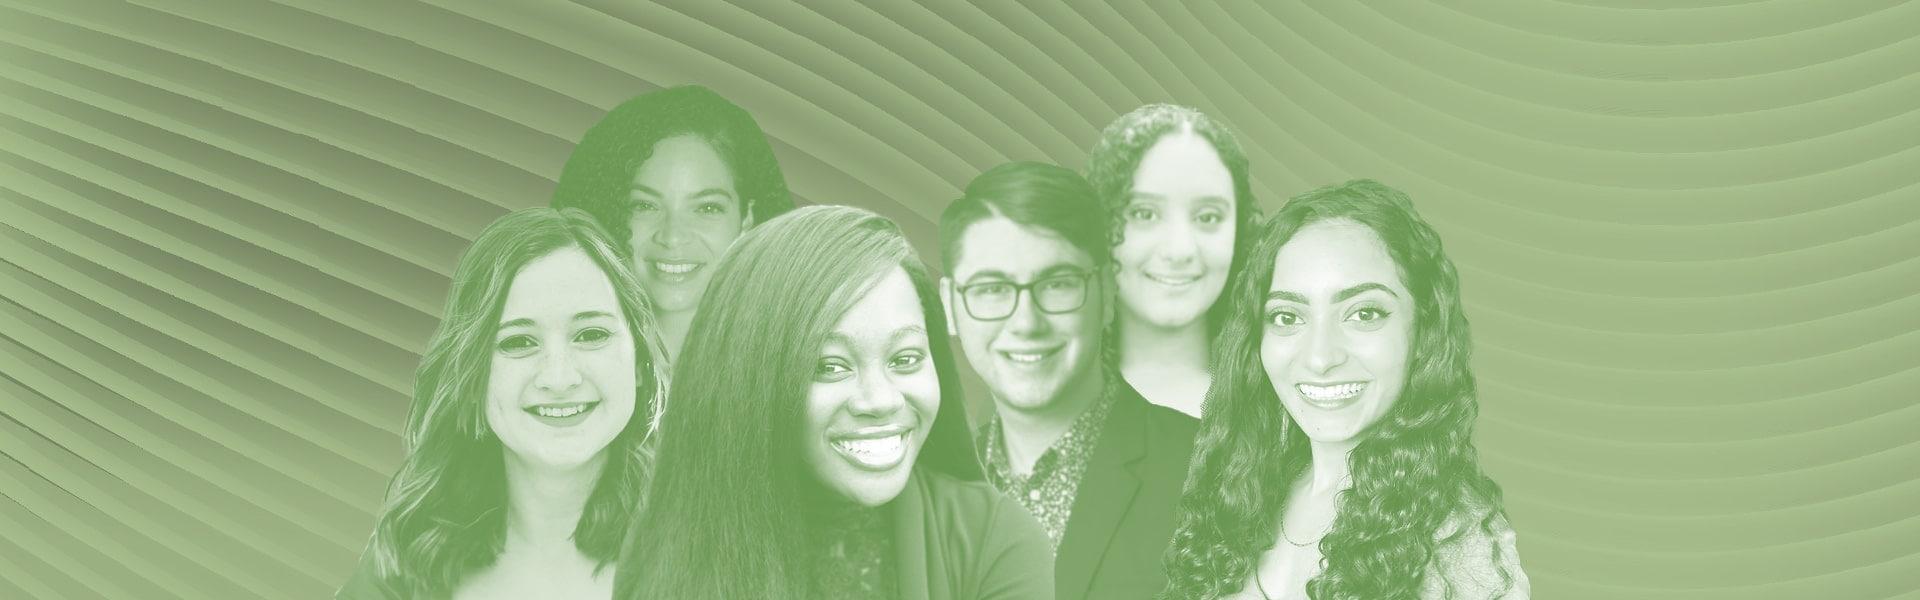 Empowering Students Scholarship Award Winners Header